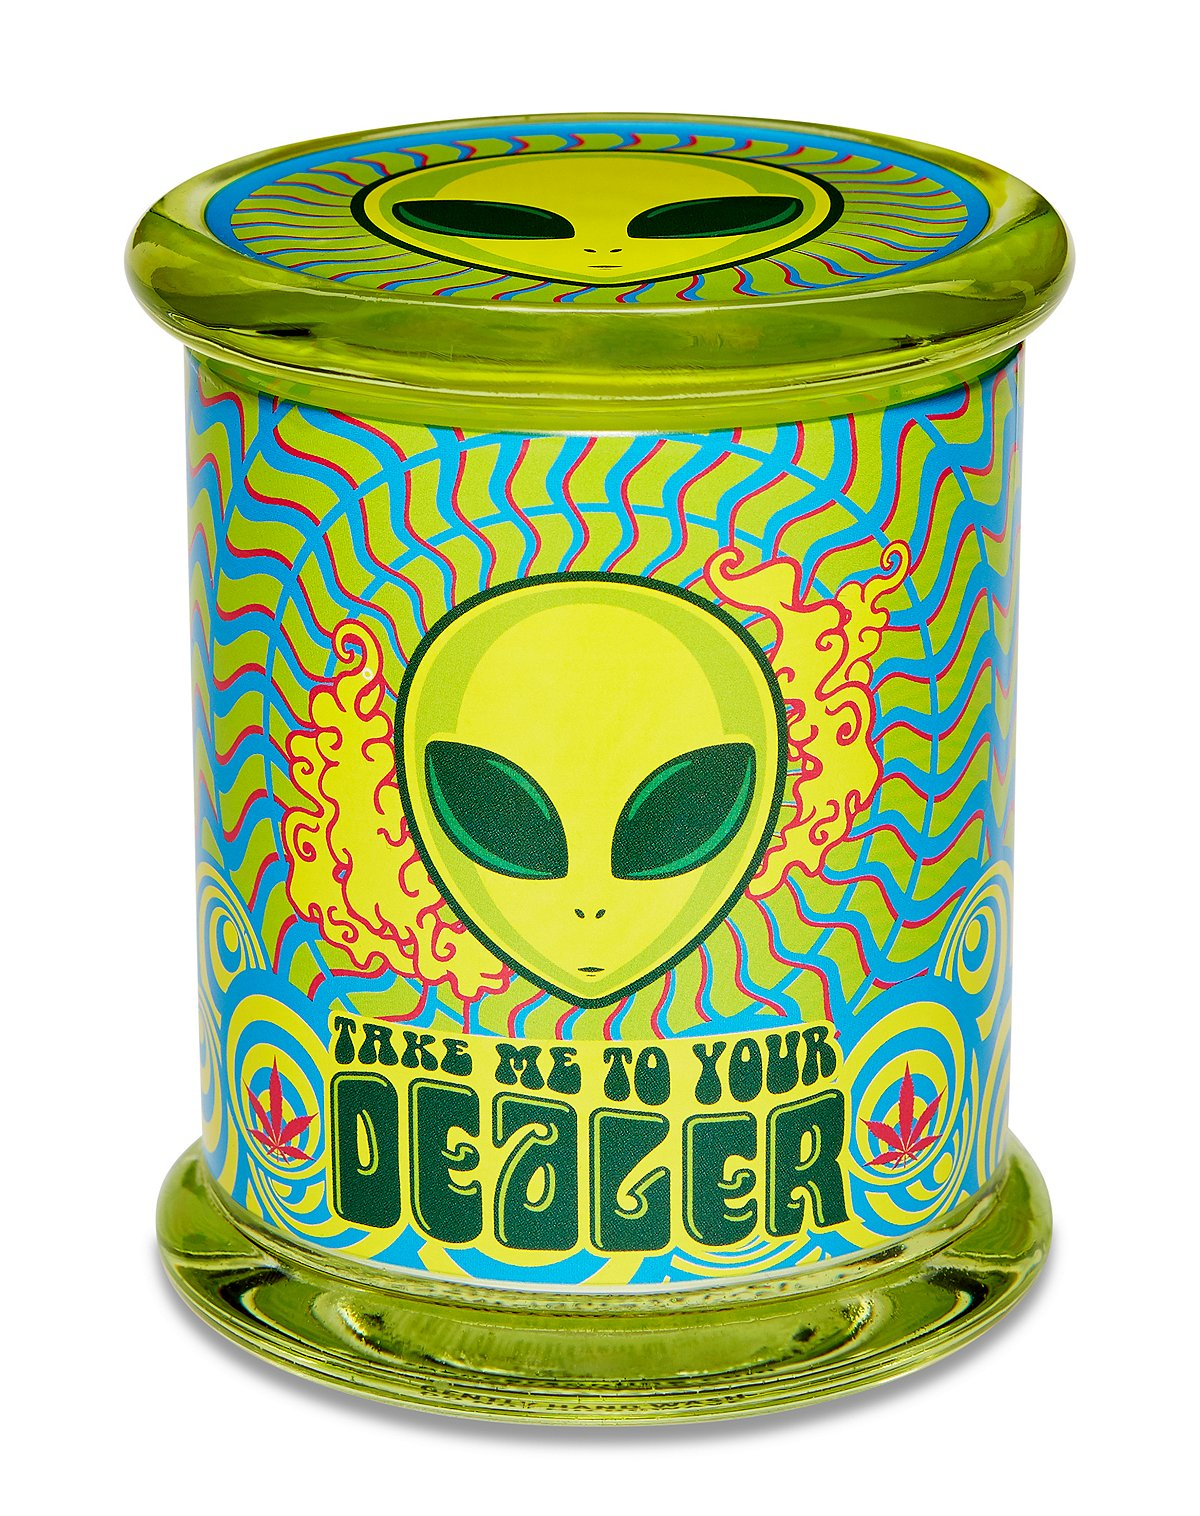 Take Me to Your Dealer Storage Jar